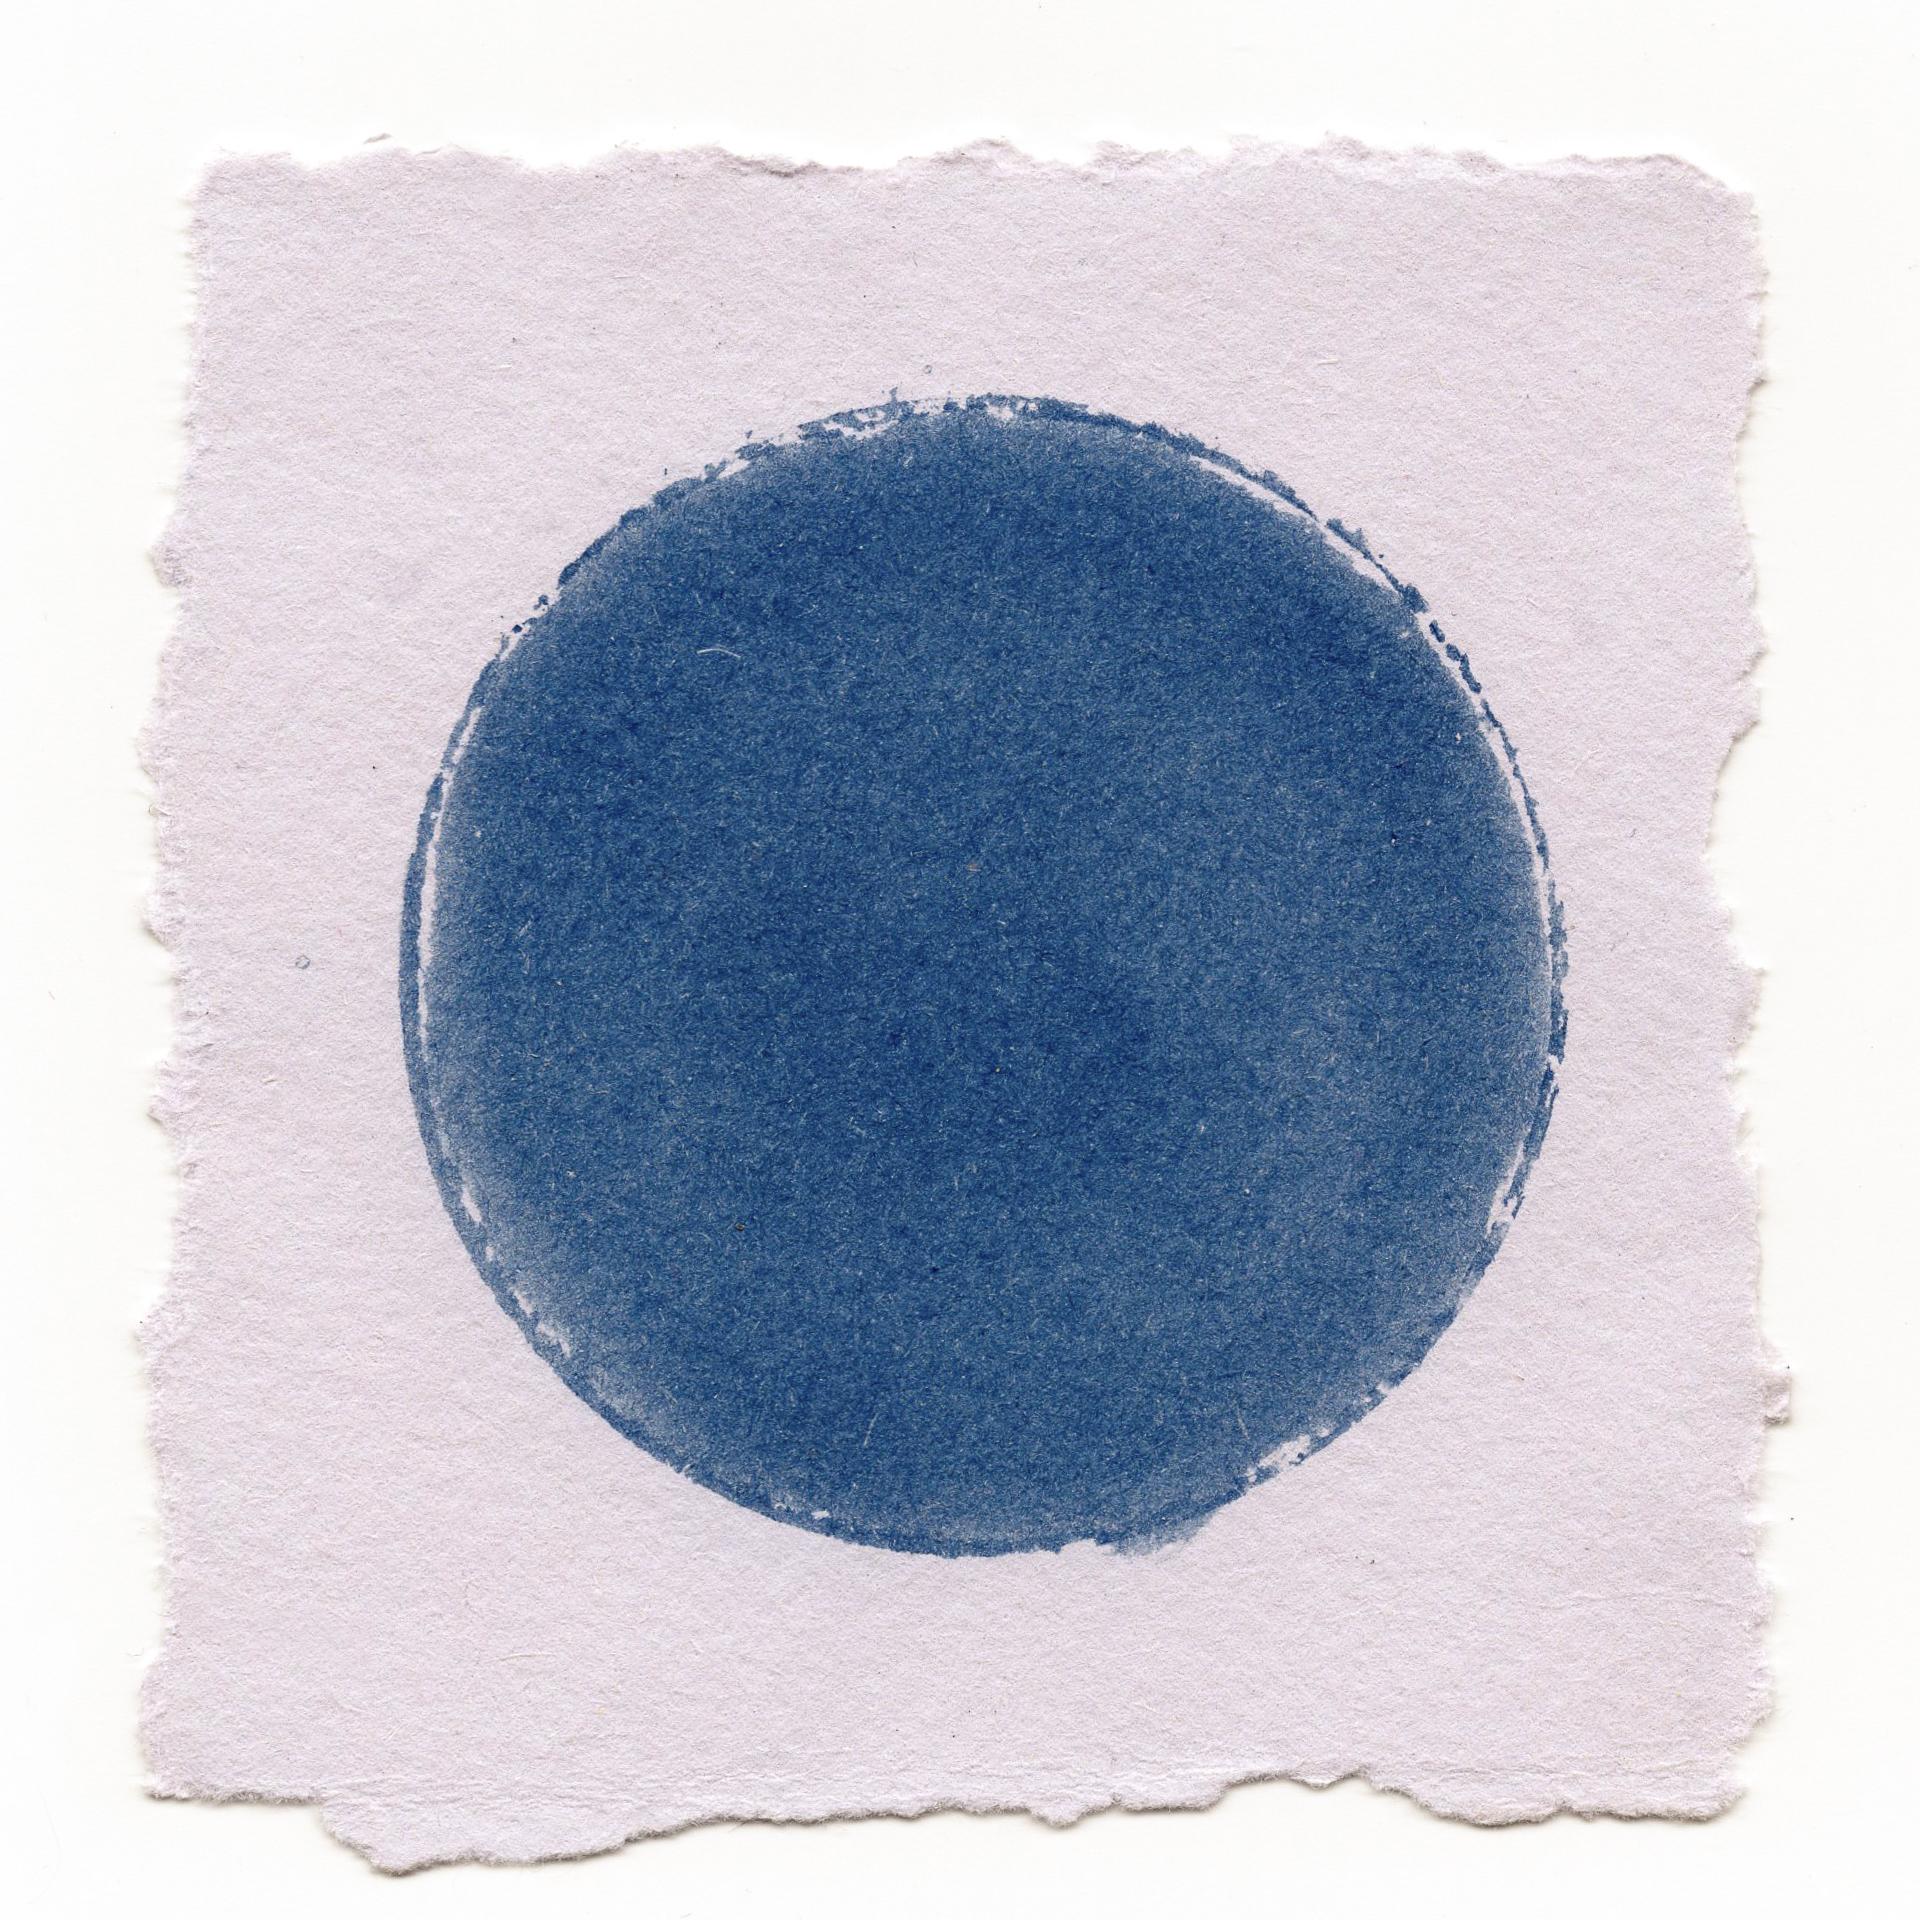 circle cyanotype (1 of 1)